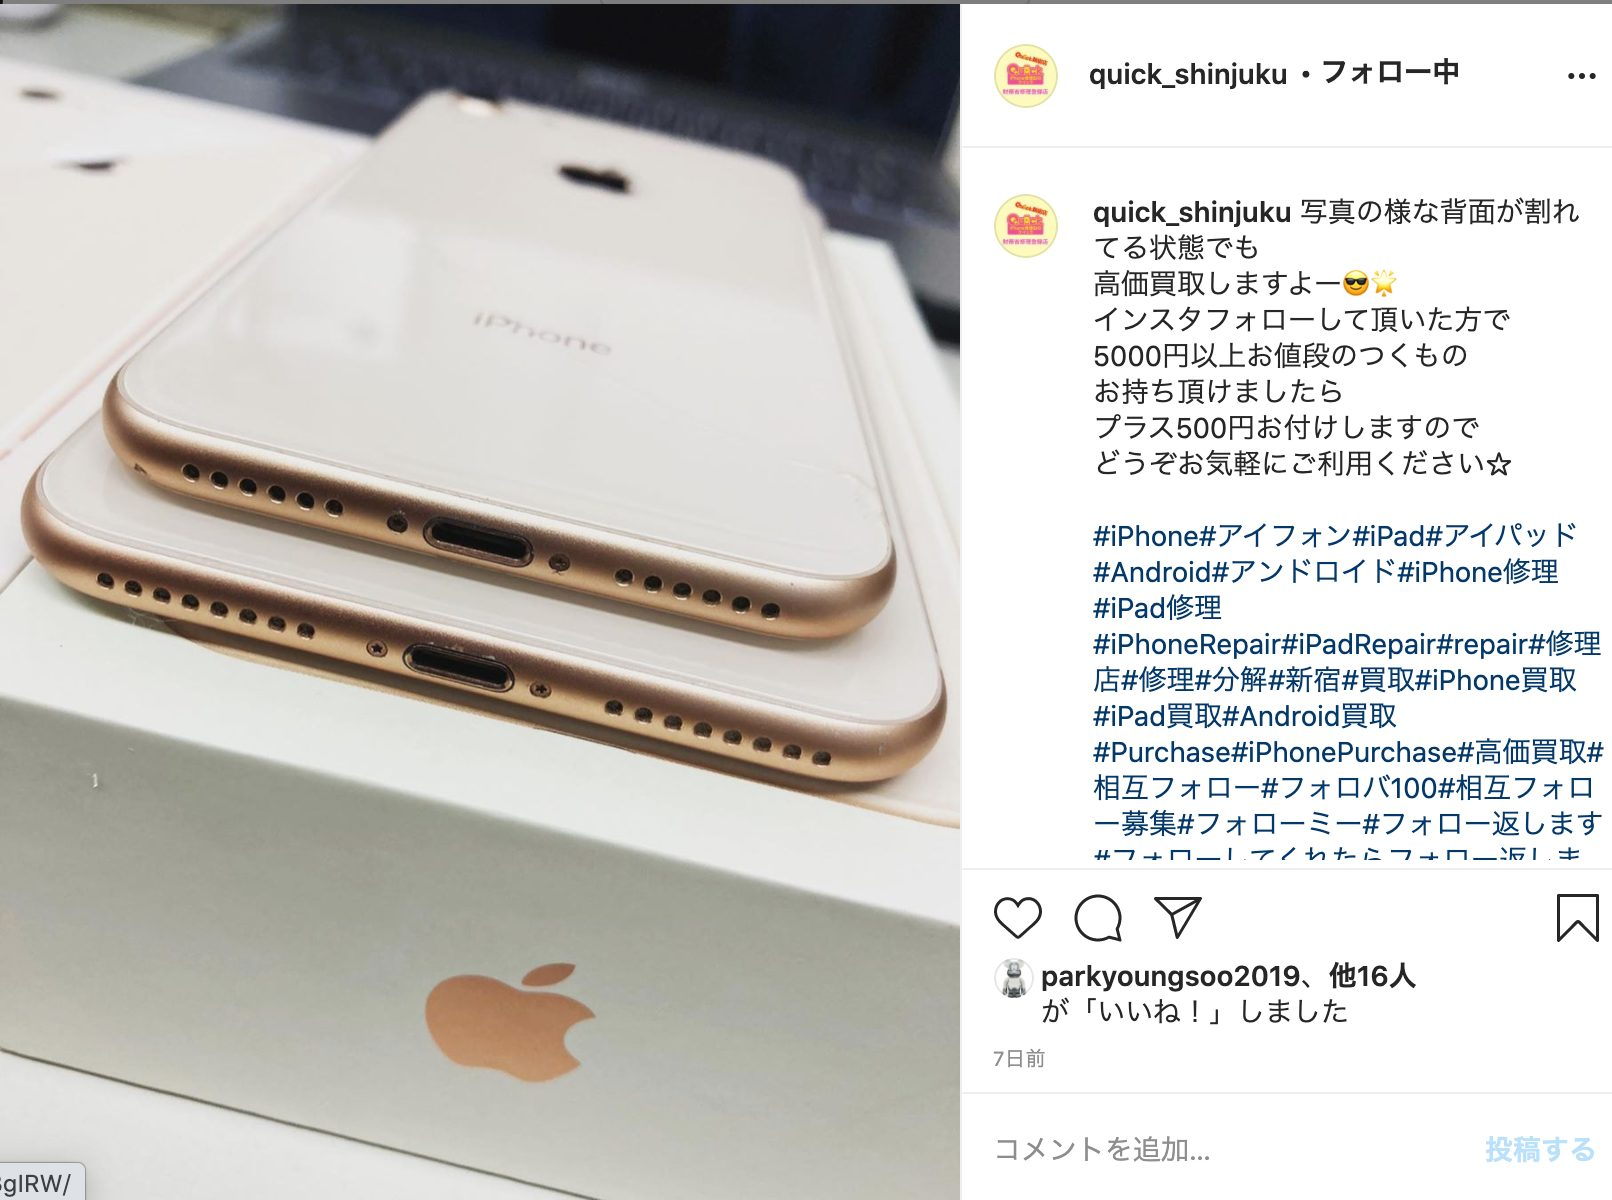 https://www.instagram.com/quick_shinjuku/